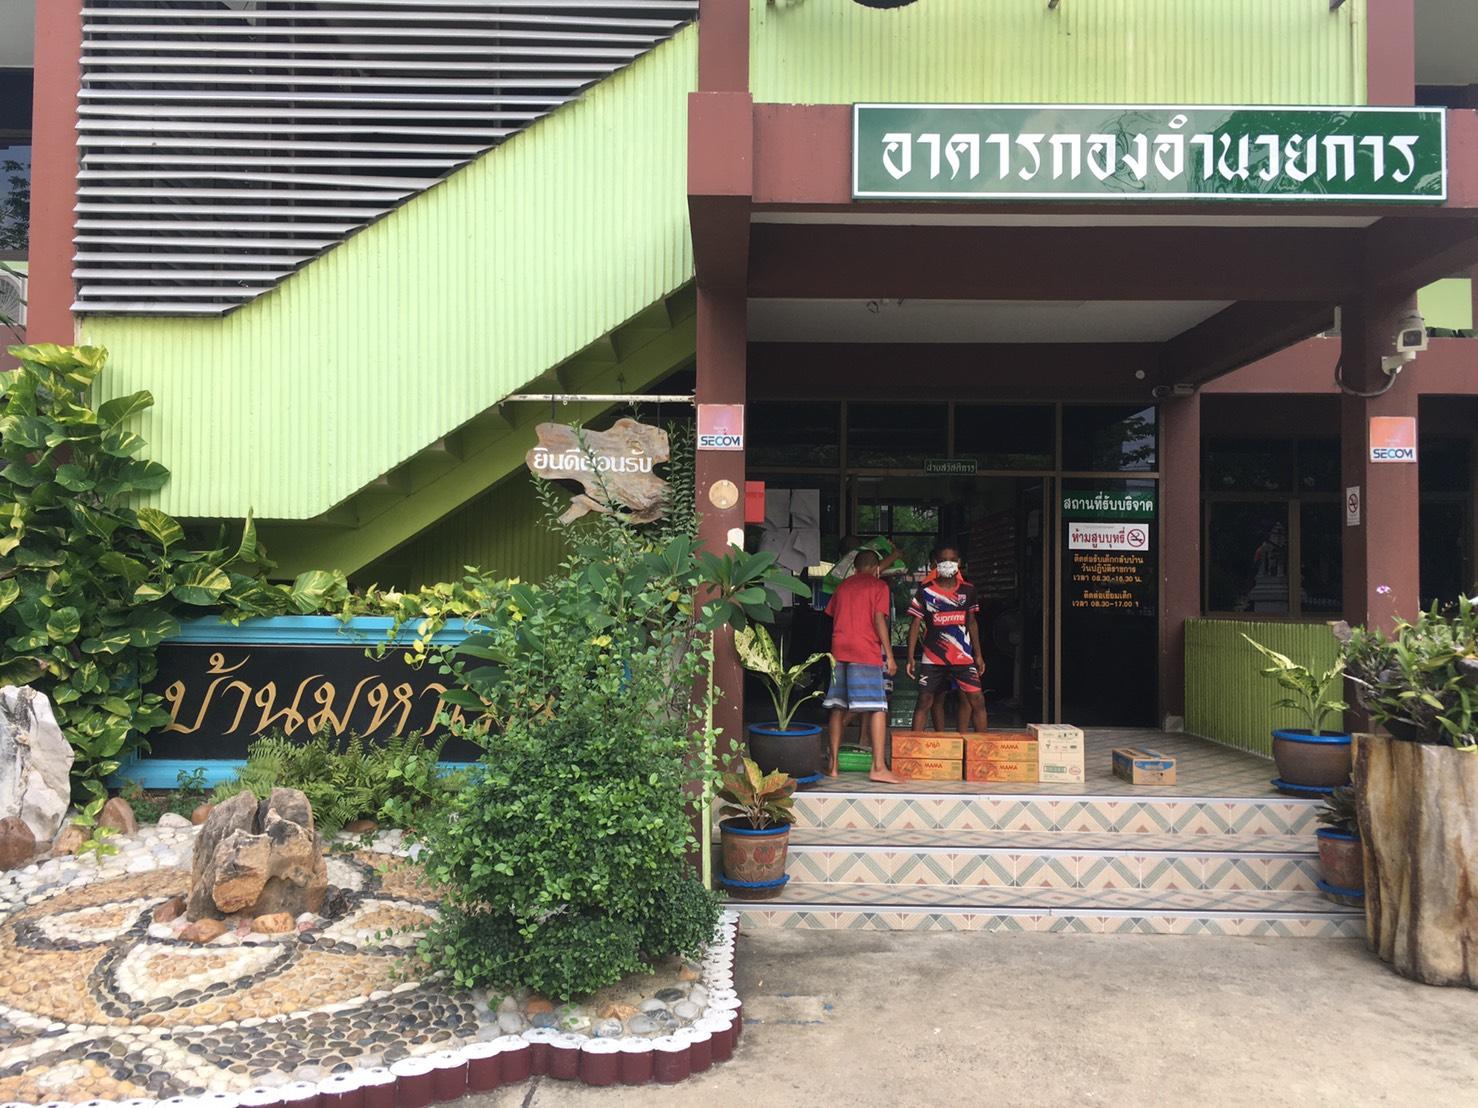 NPOボールひとつが繋ぐ縁12 タイ王国 バンコク bannmahamek LIVE支援(2021年4月17日)